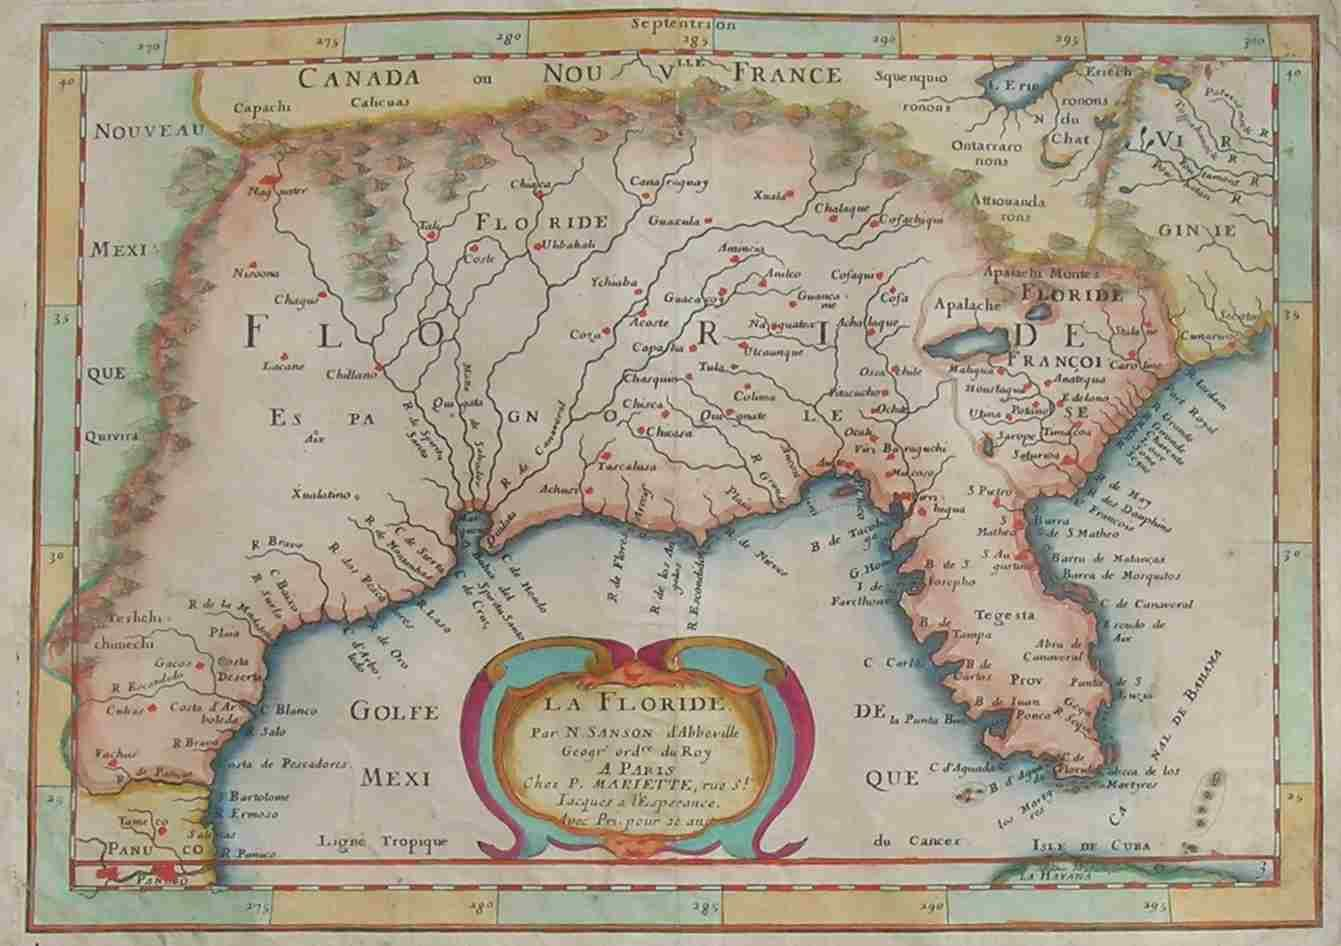 Florida Louisiana La Floride || Maphouse Antique Maps | Michael - Florida Louisiana Map